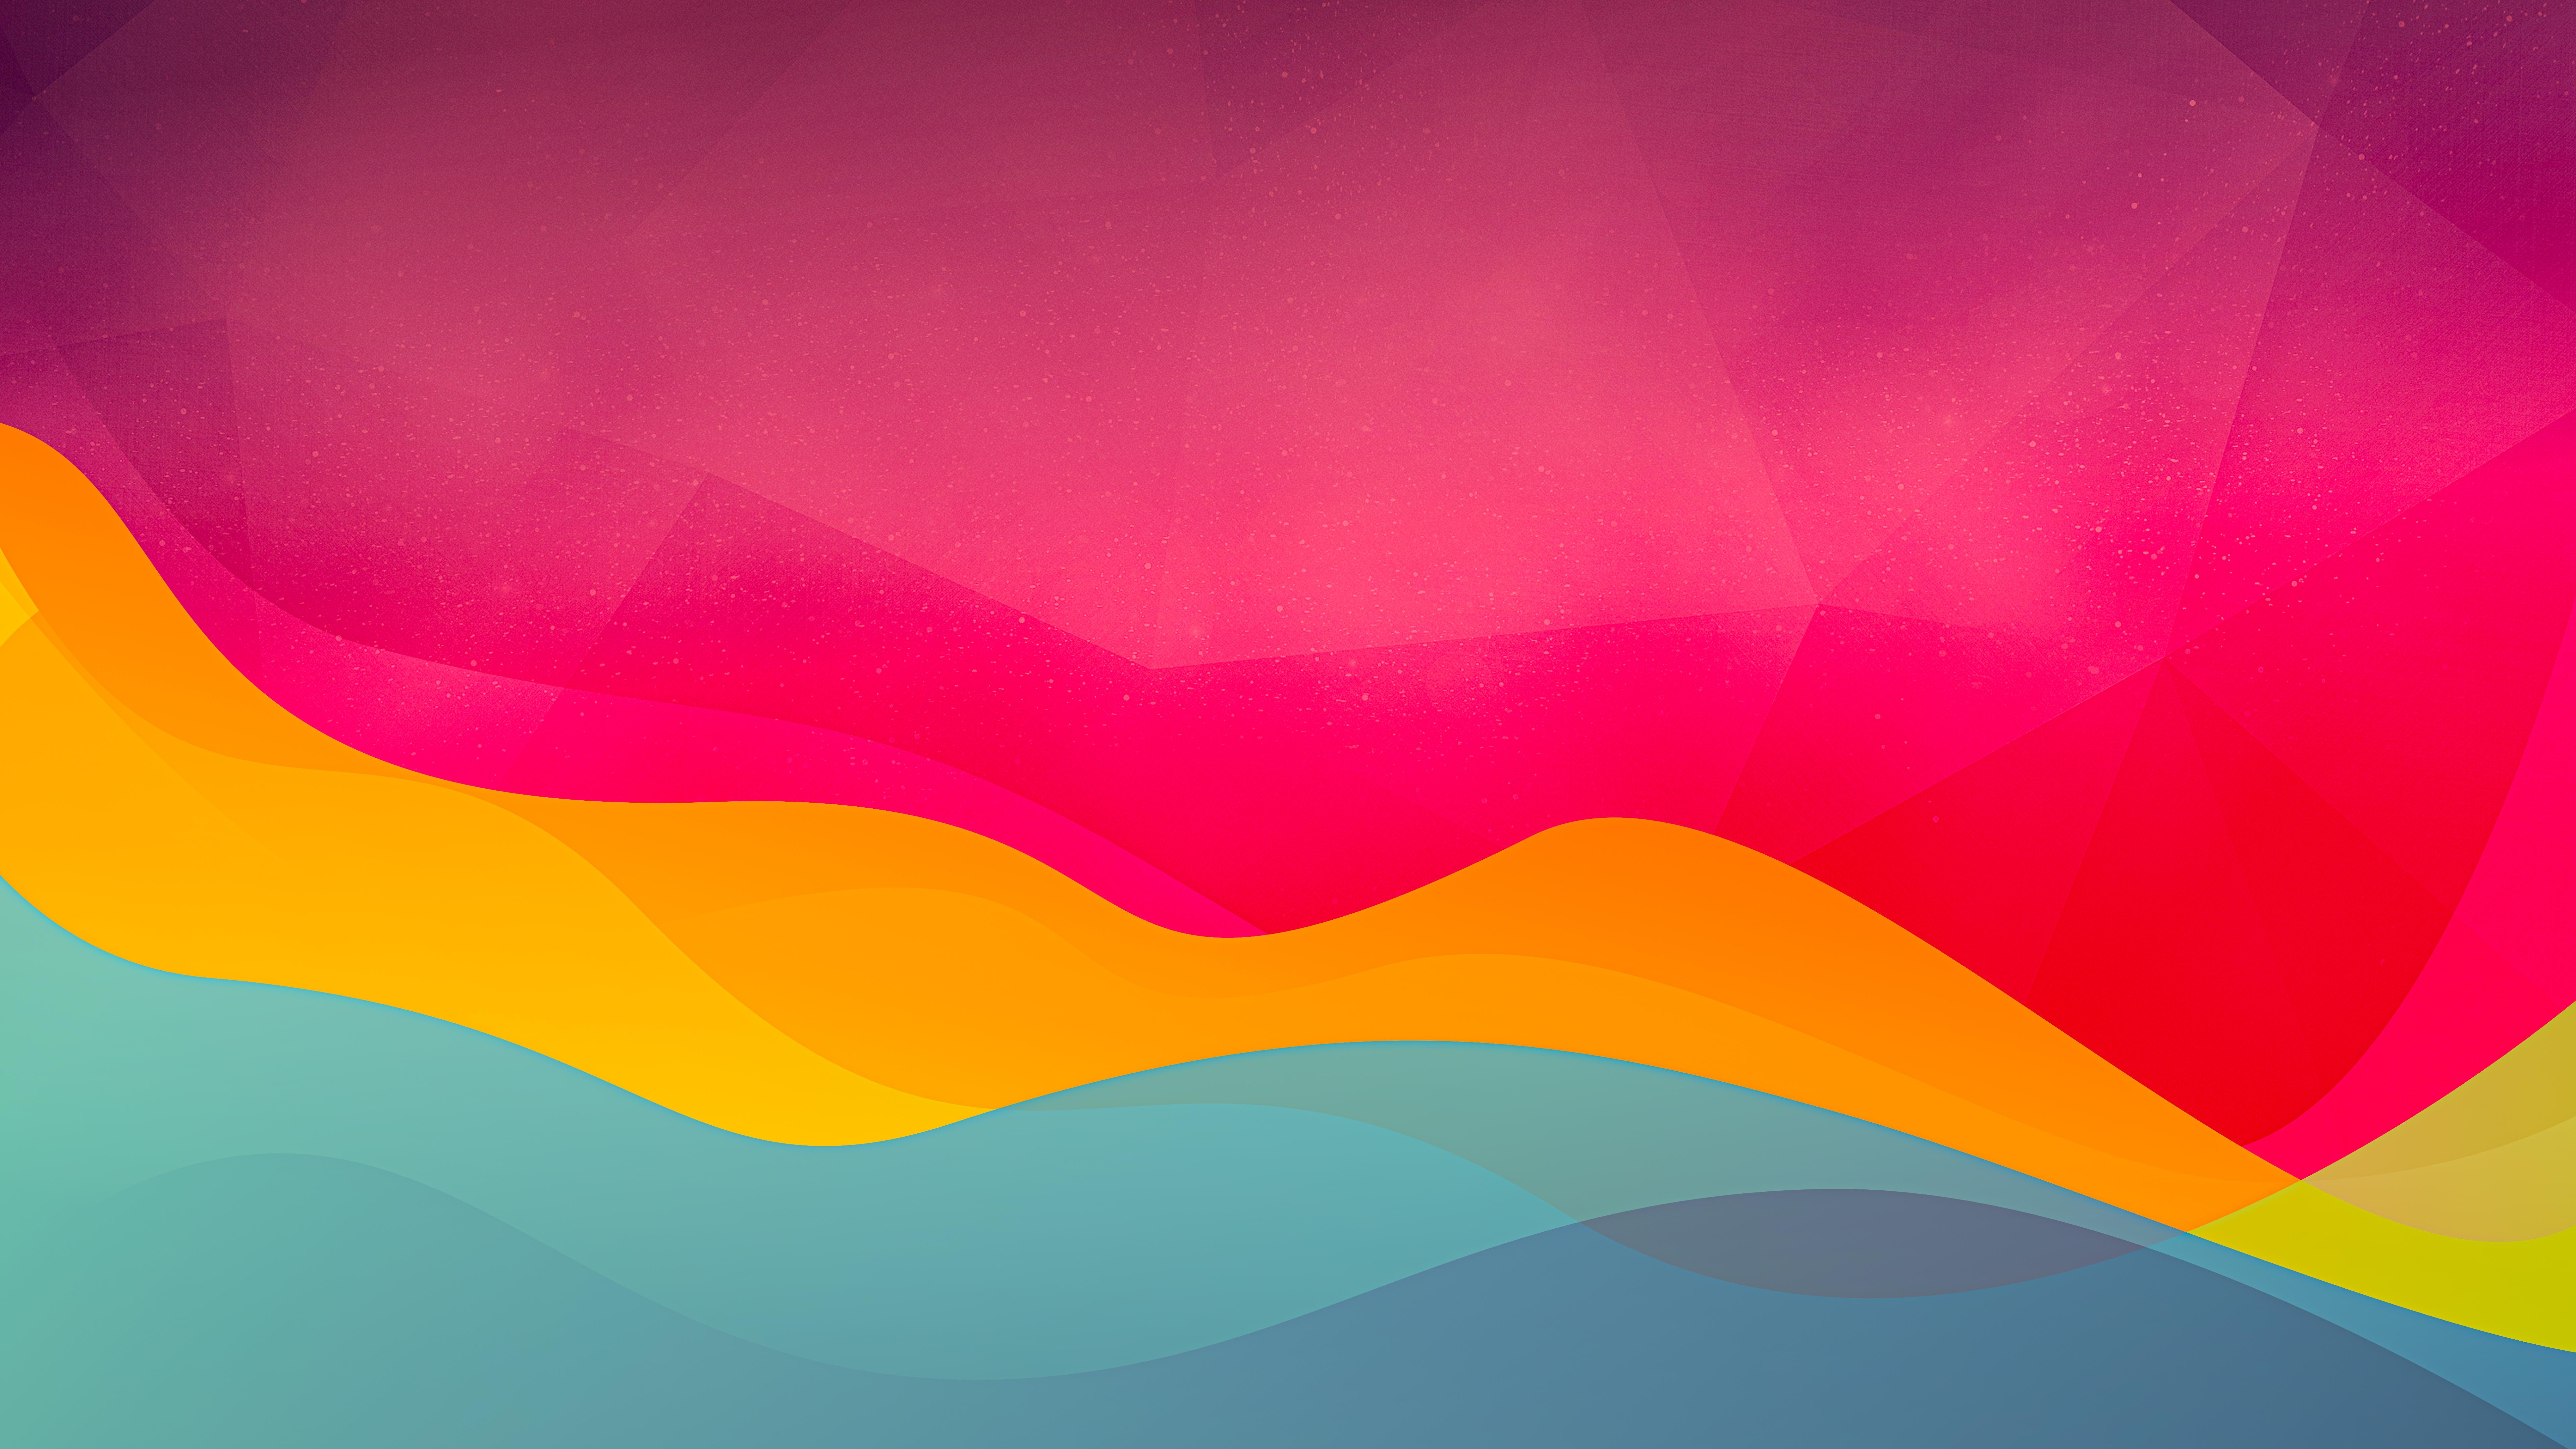 abstract 4k 1616870926 - Abstract 4k - Abstract 4k wallpapers